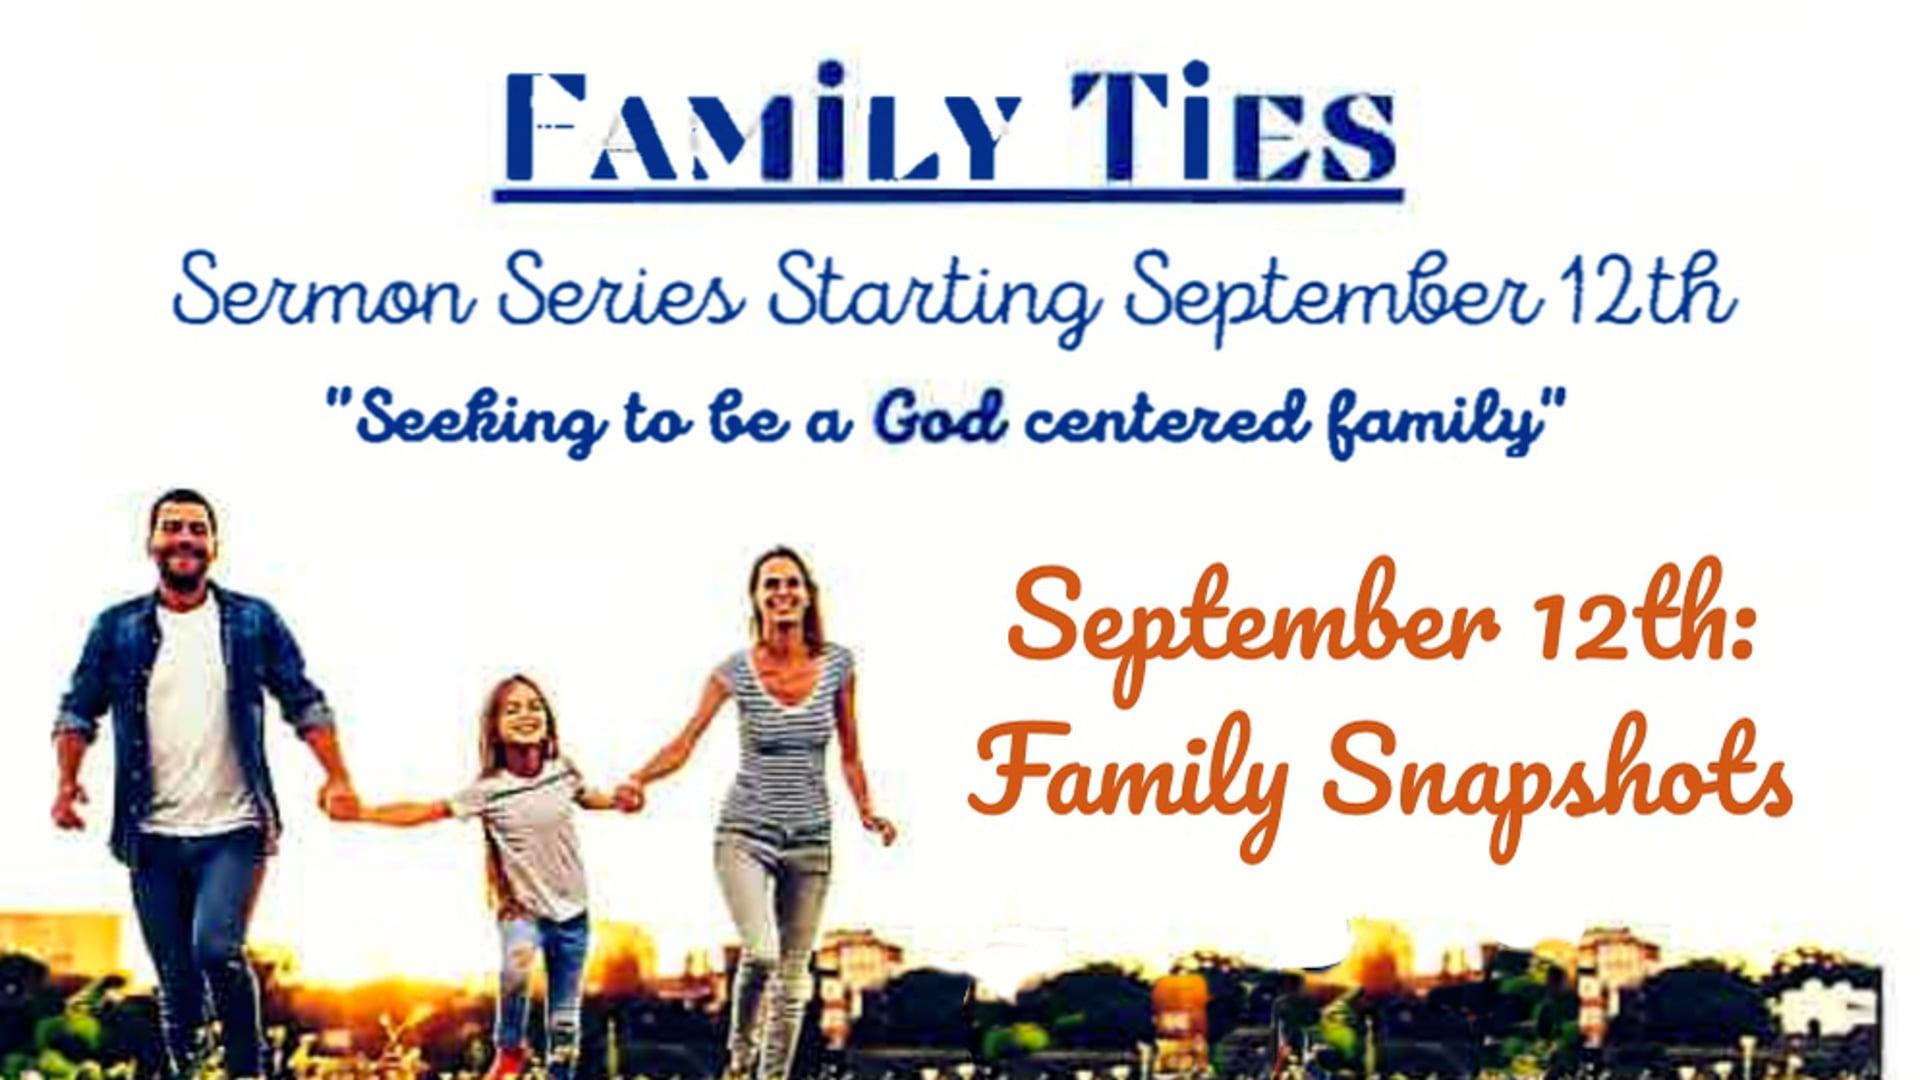 Royston Baptist Church 11 AM Worship Service Message for Sept. 12, 2021